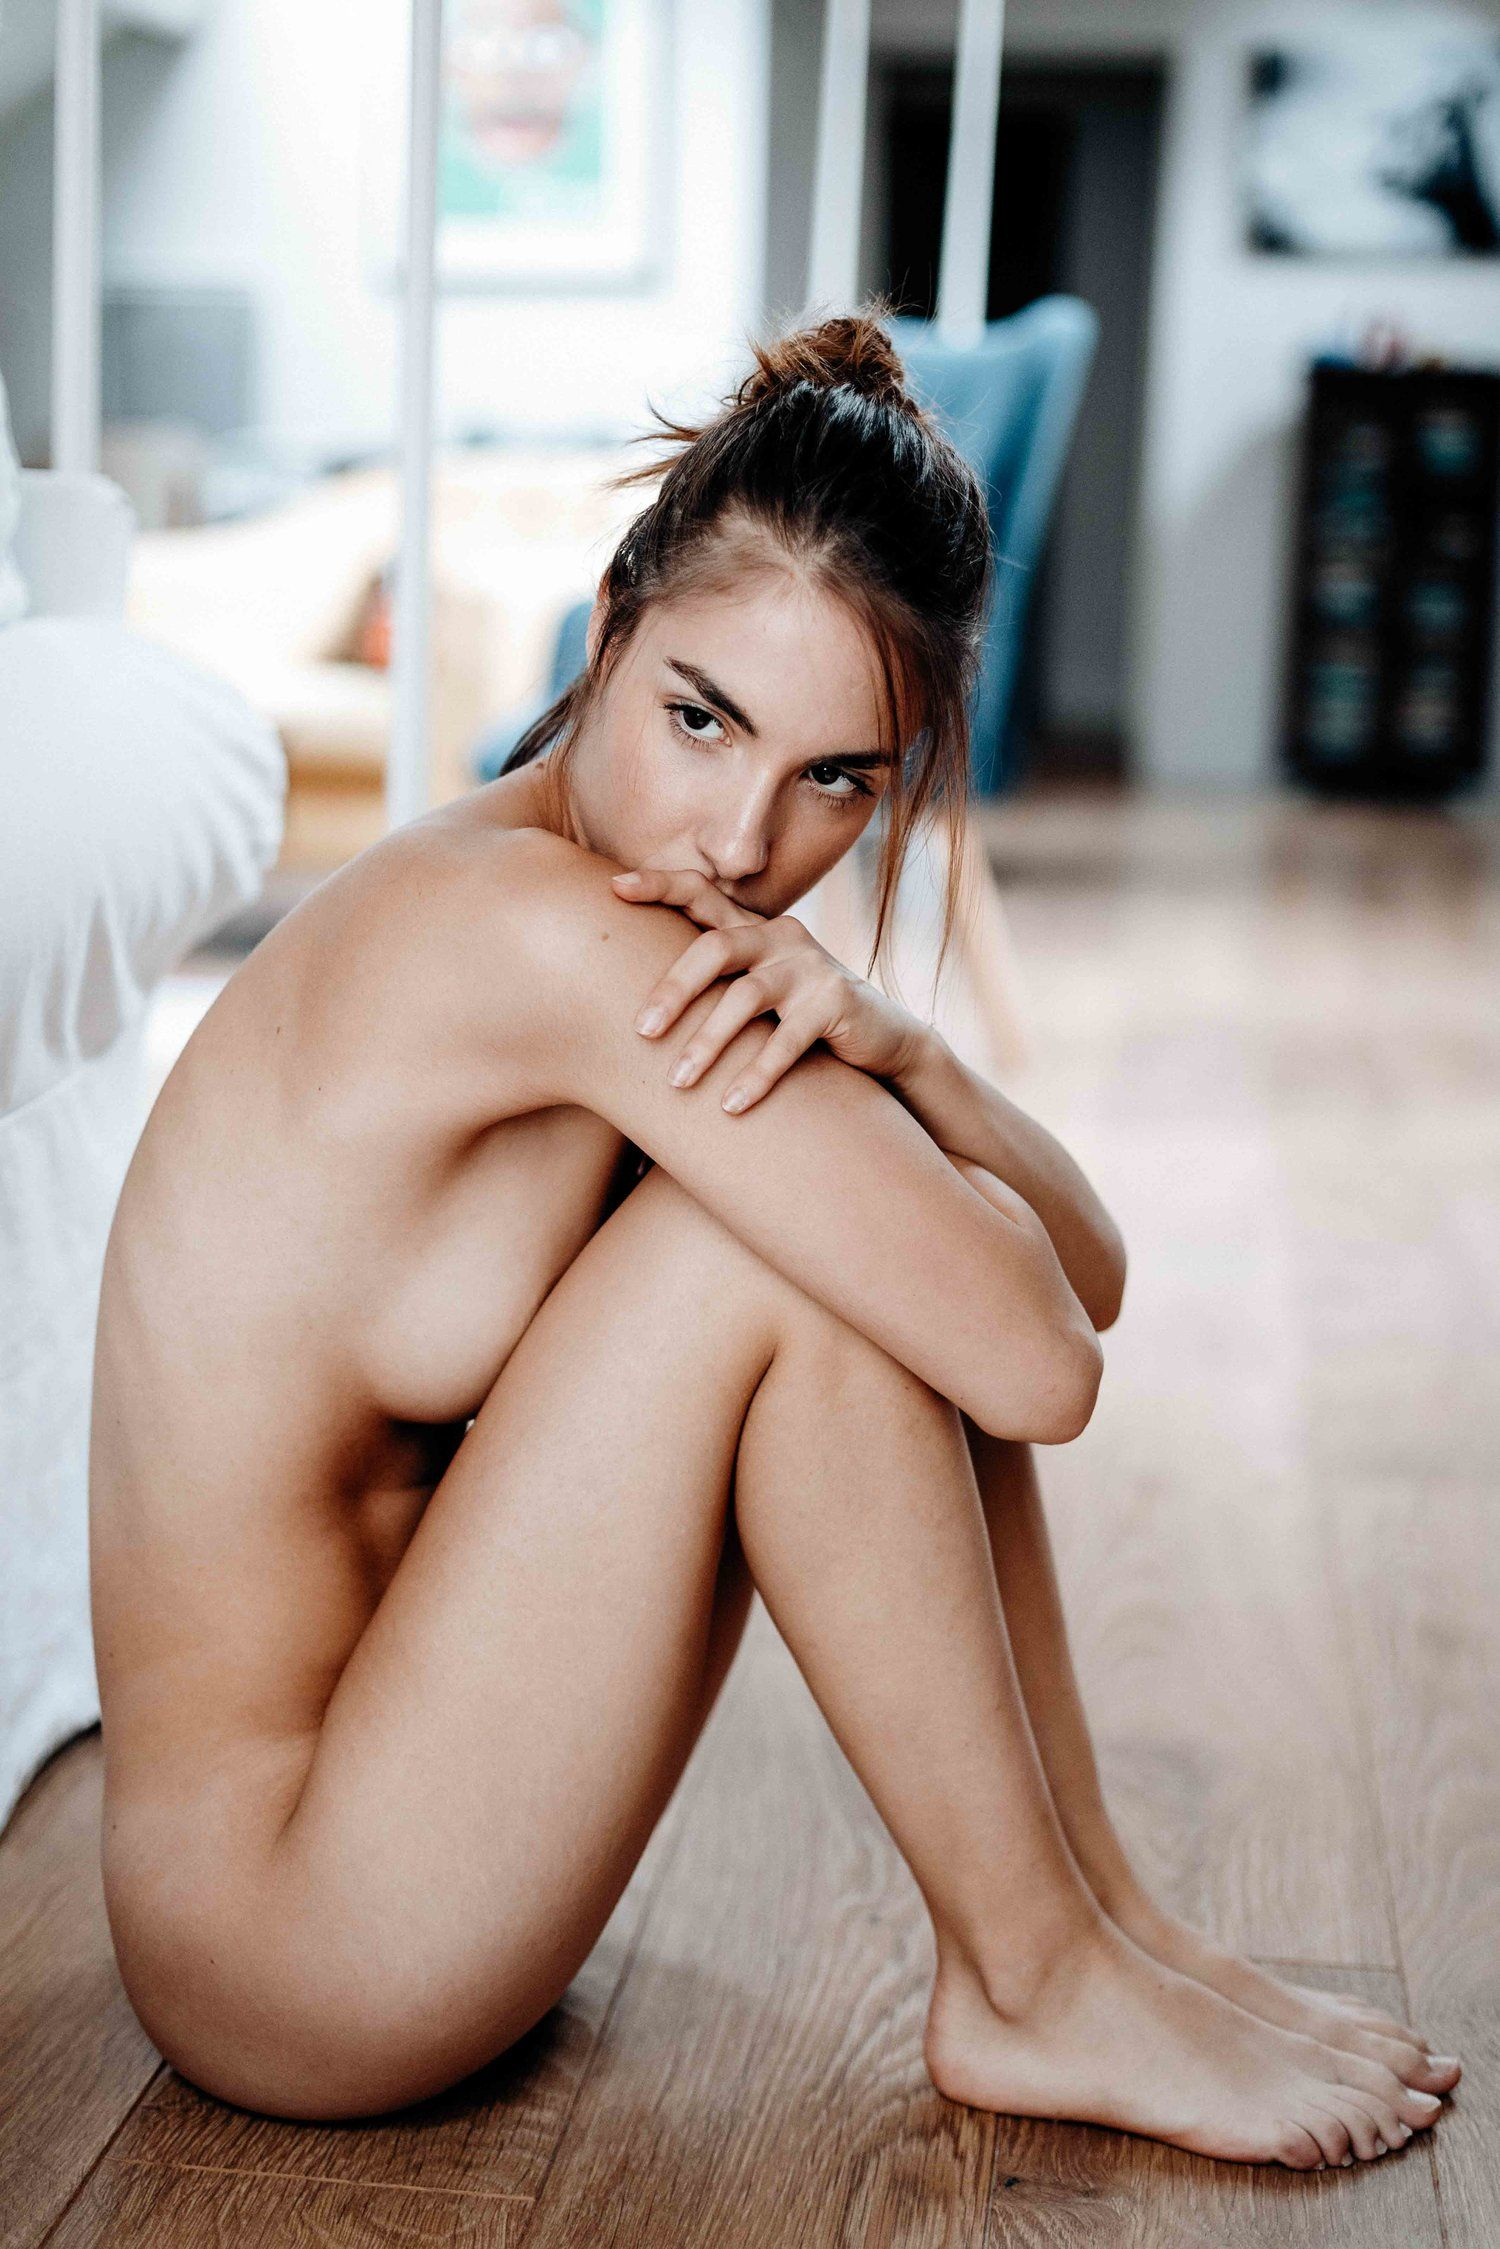 Snapchat Rebecca Bagnol nudes (77 photo), Sexy, Leaked, Selfie, cameltoe 2020